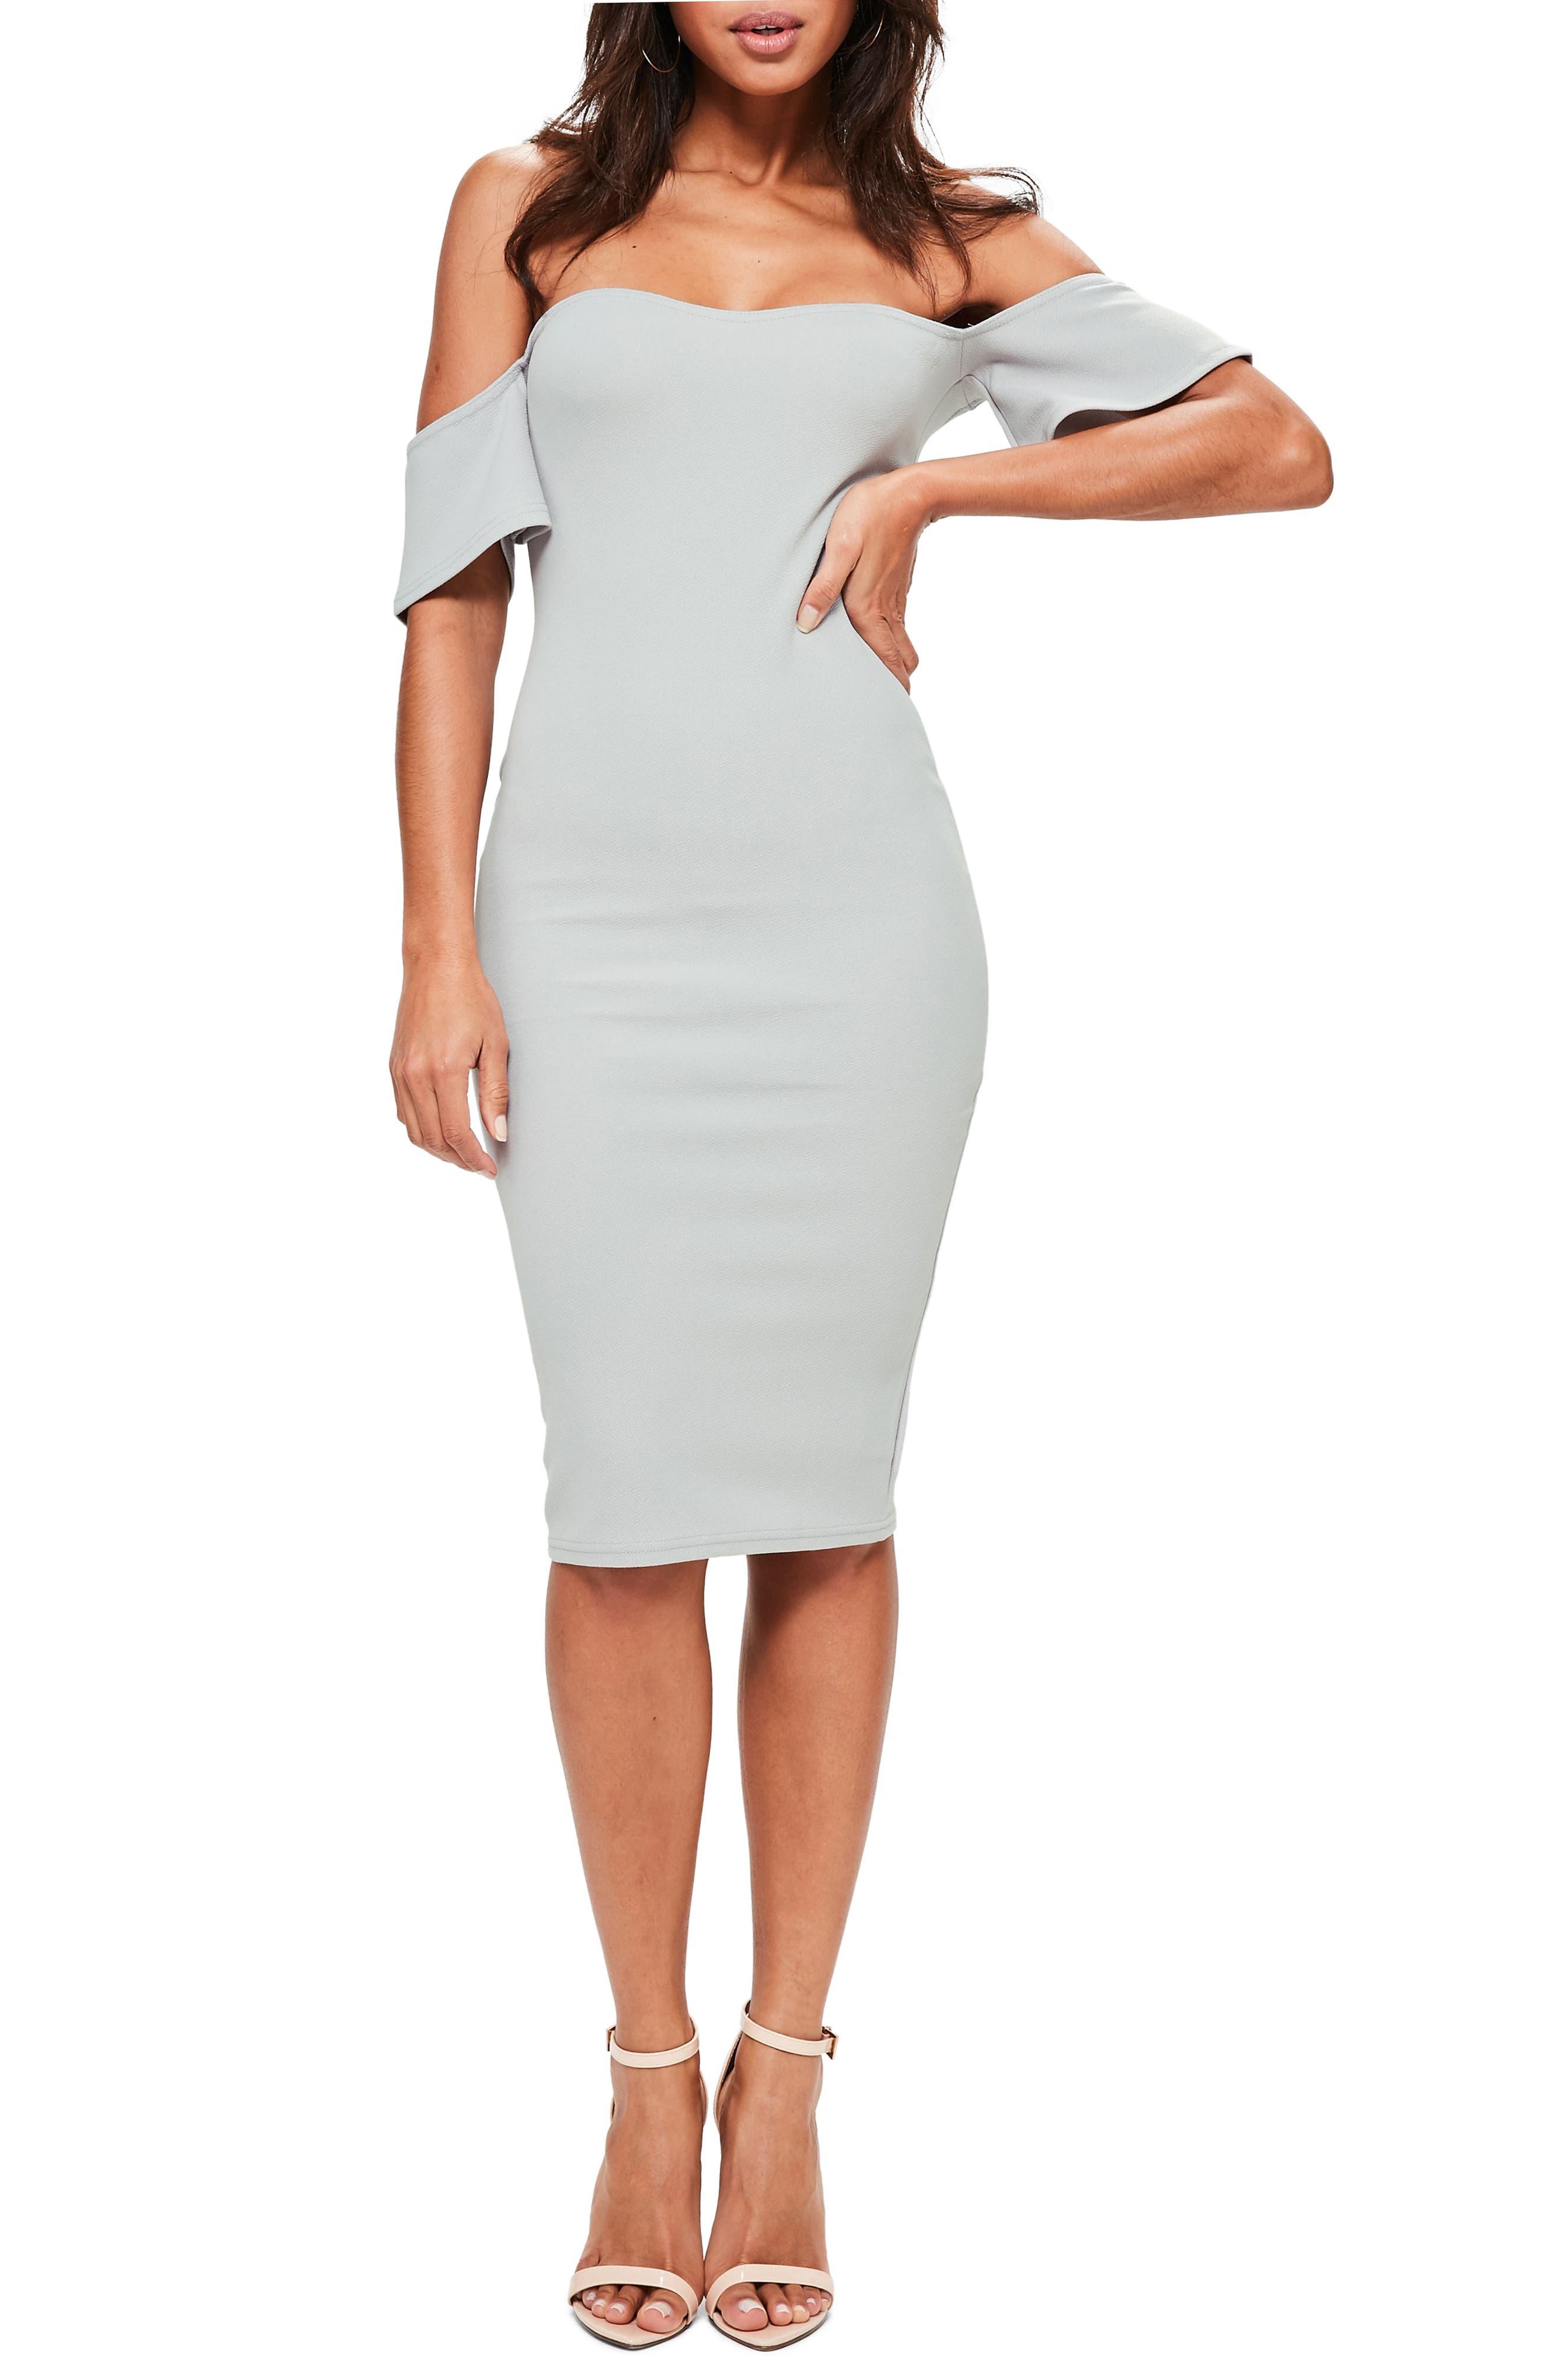 Alternate Image 1 Selected - Missguided Bardot Stretch Crepe Off the Shoulder Dress